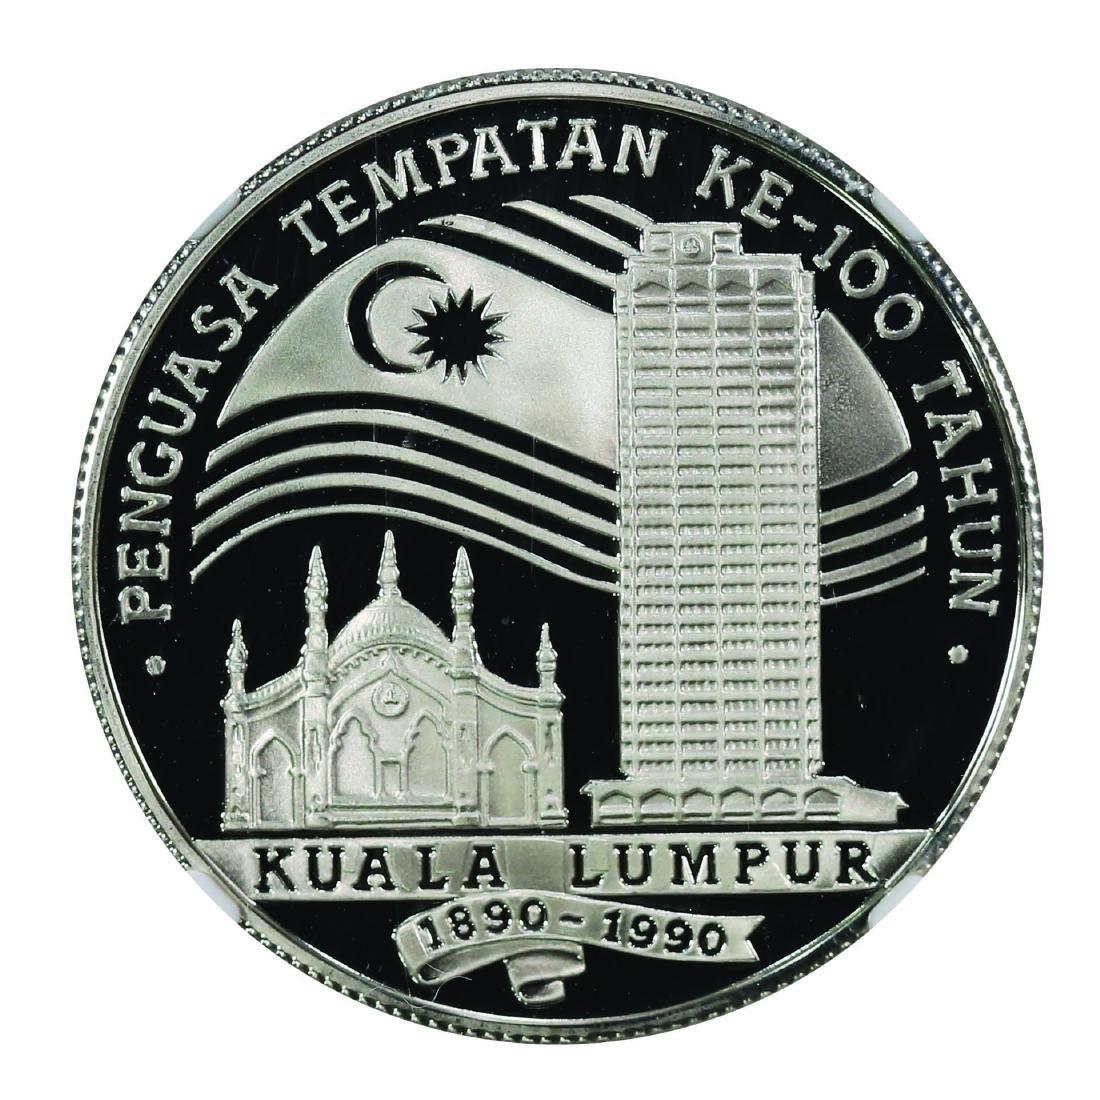 Malaysia 1990. RM25 Kuala Lumpur 100 Years NGC PF69UC